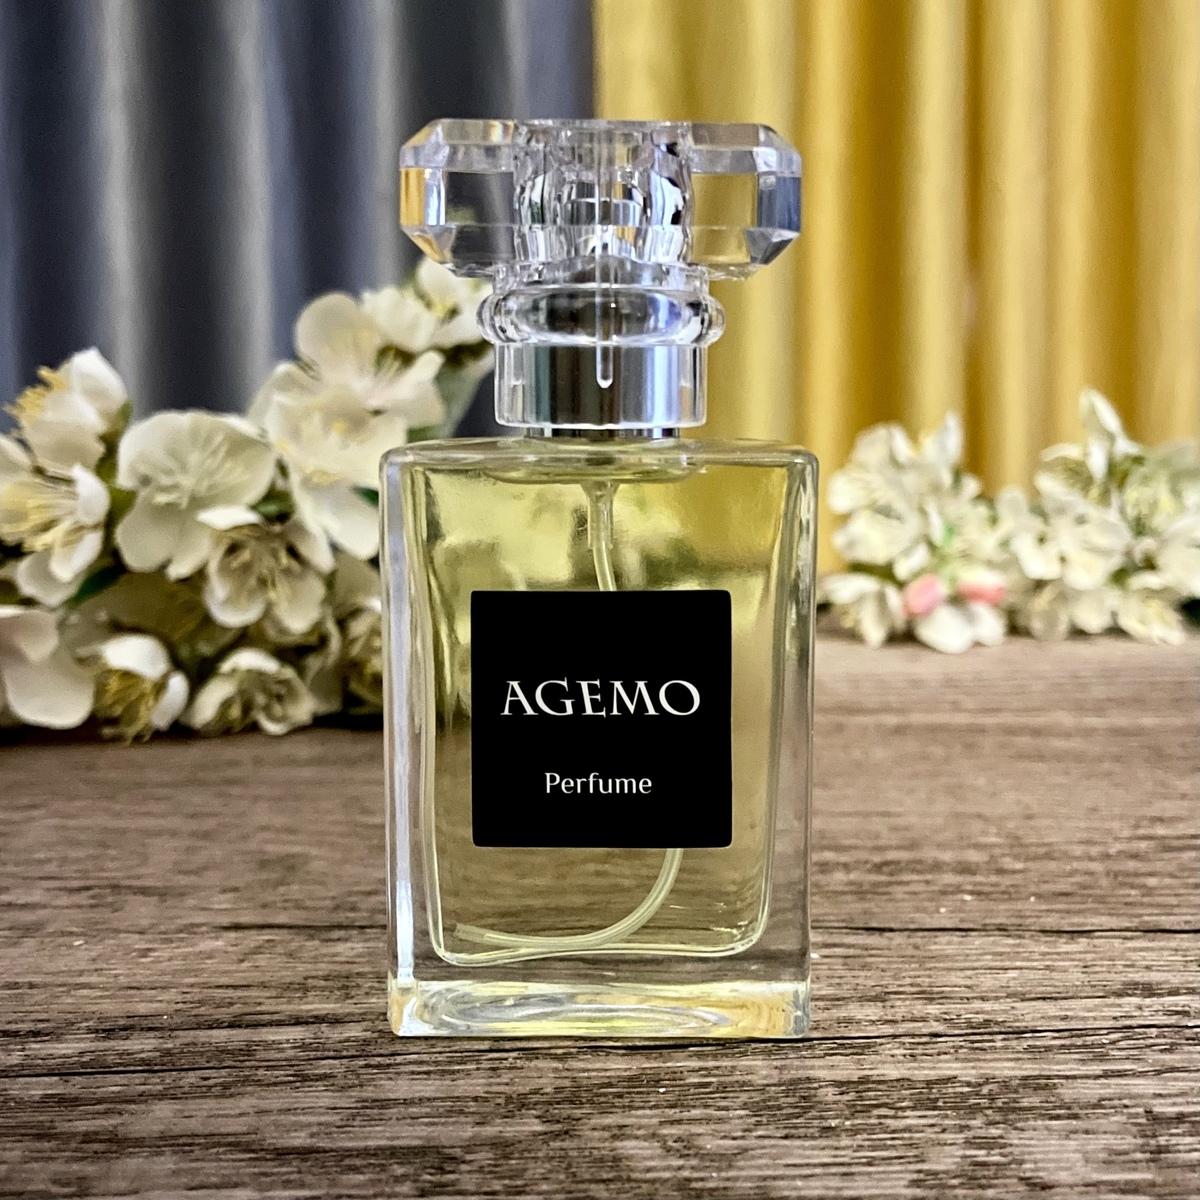 Agemo Soap白蘭花香水母親節優惠價 $198。(Agemo Soap提供)